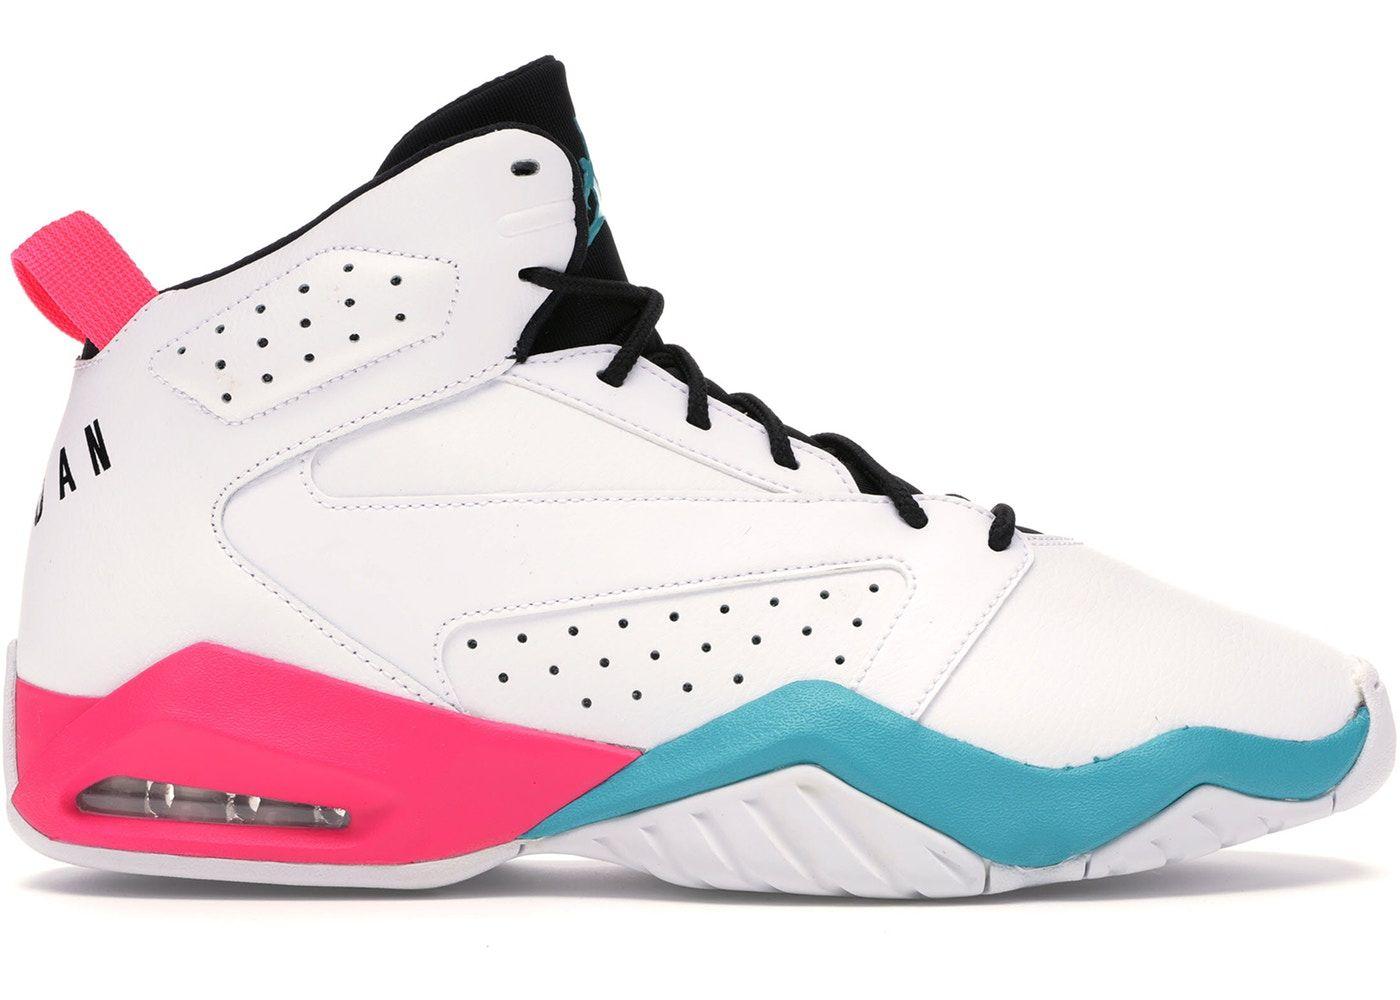 Jordan Lift Off South Beach Jordans Beach Shoes South Beach